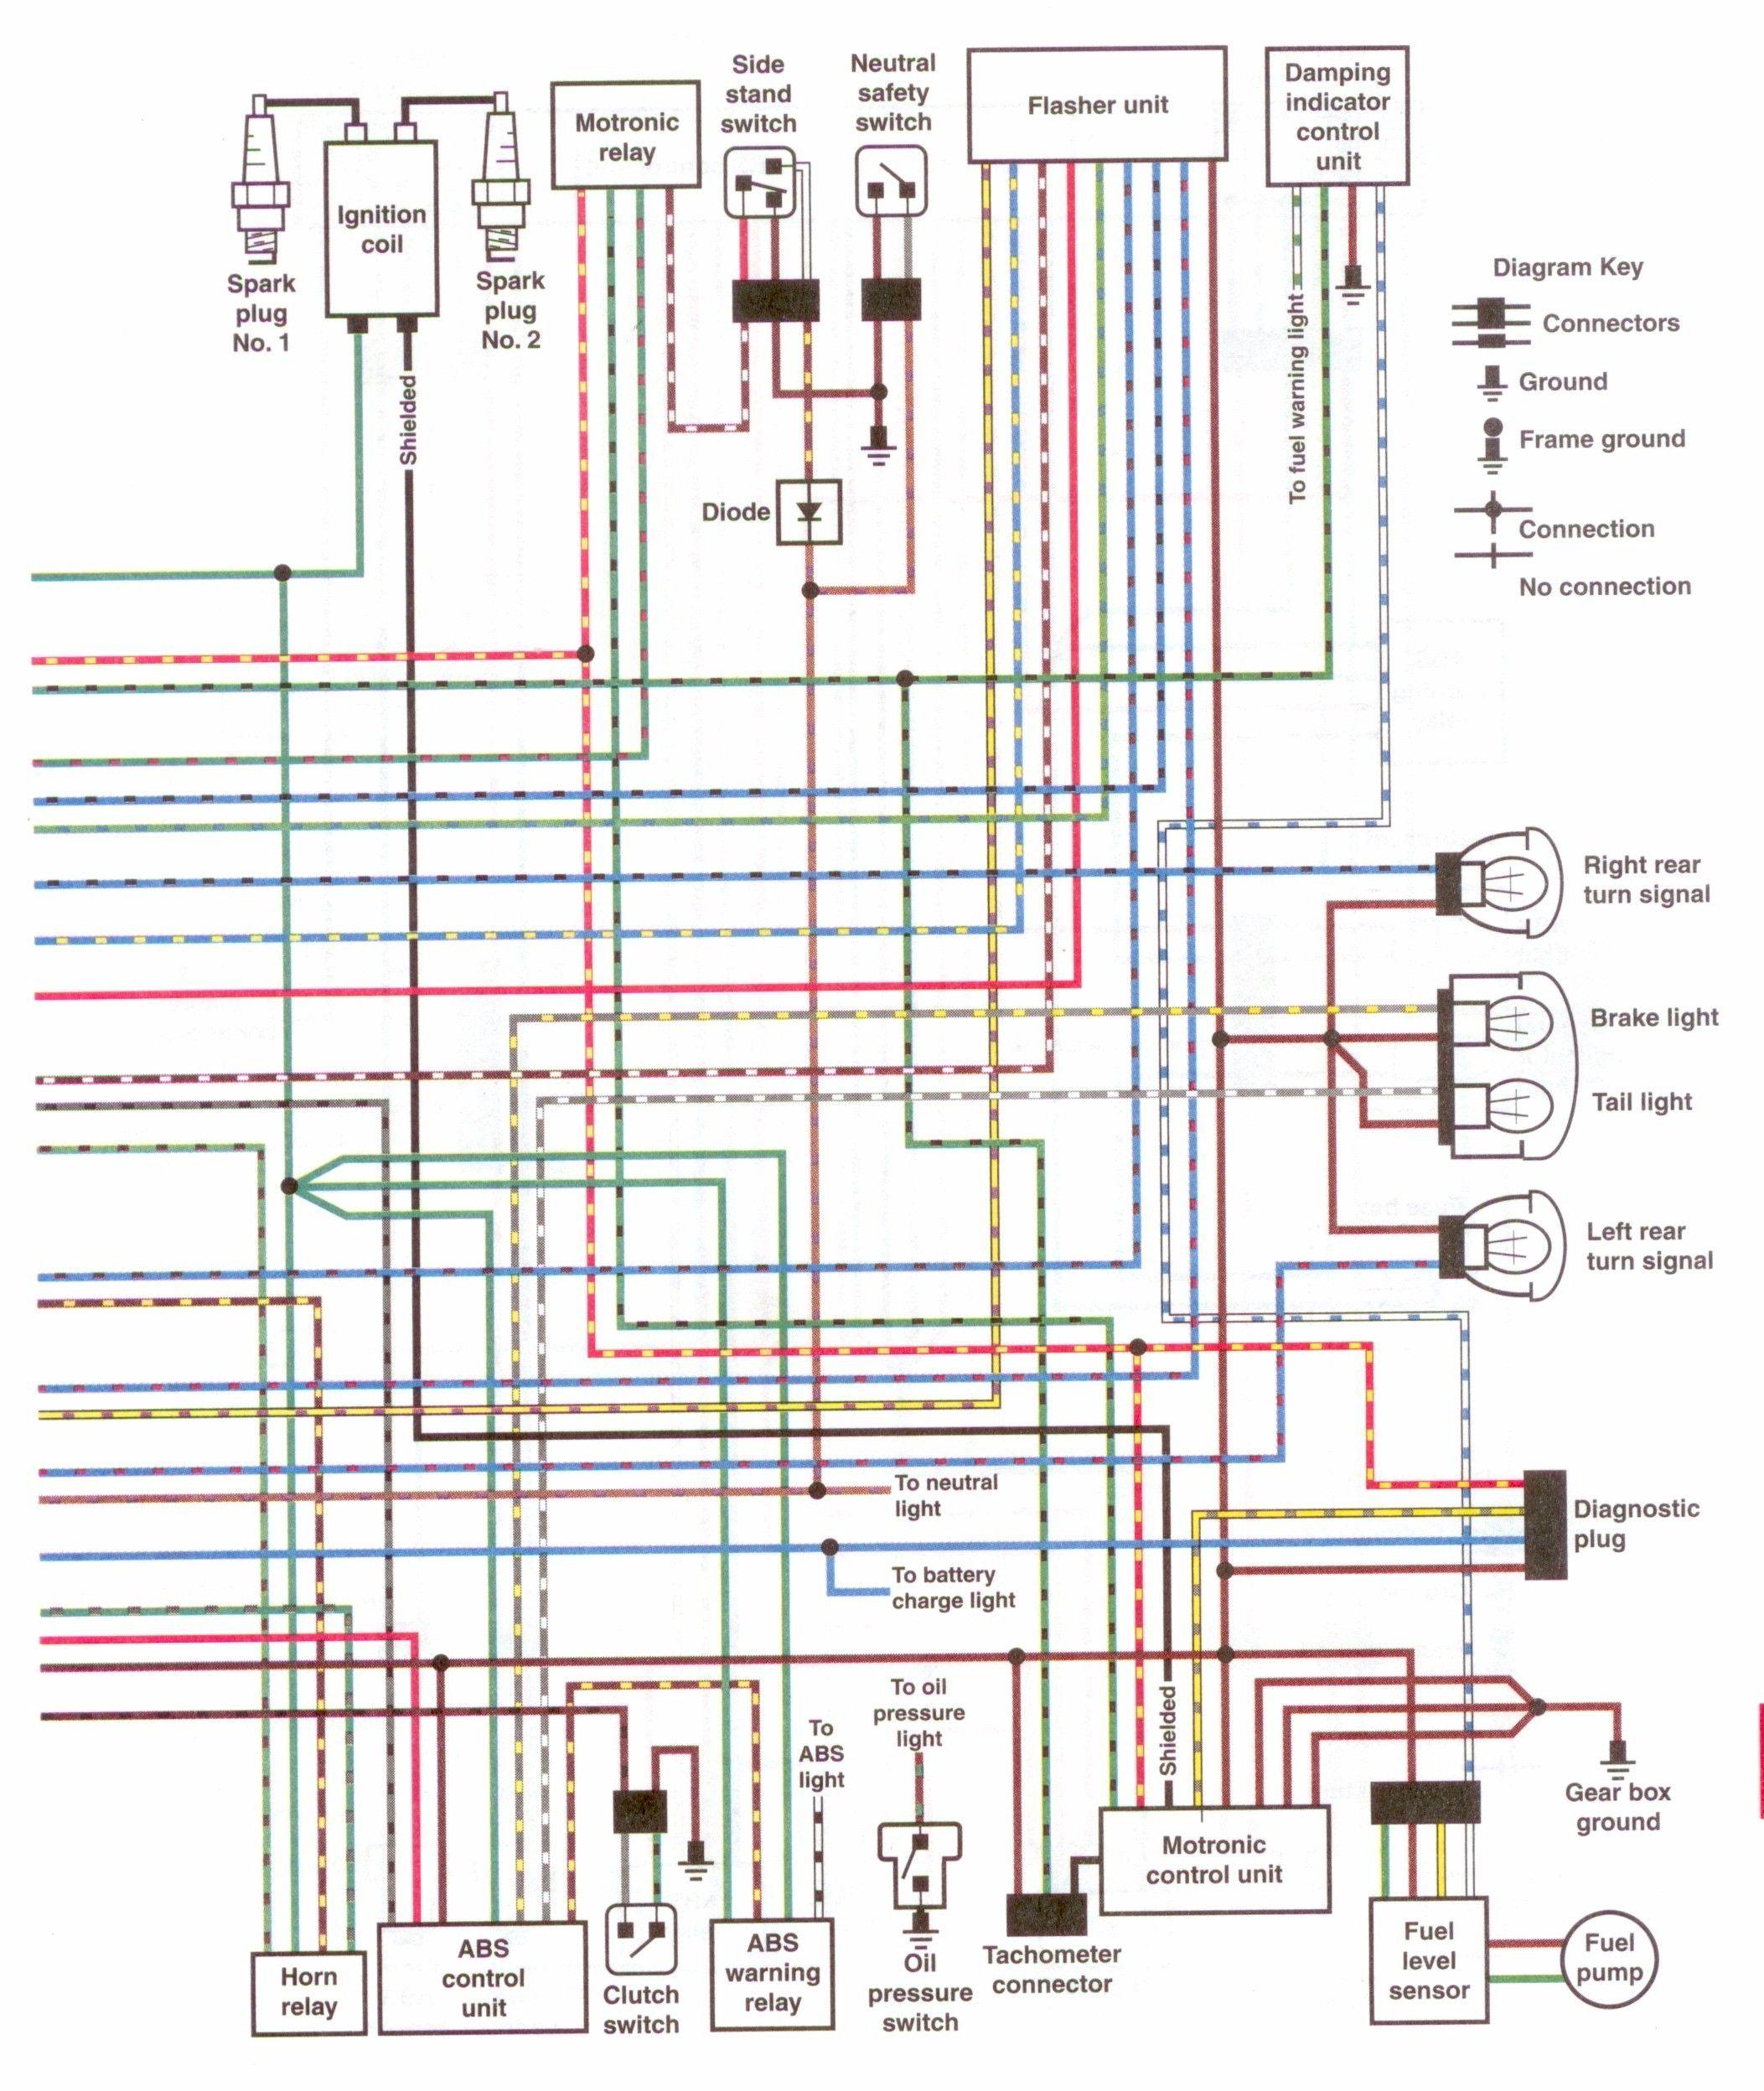 bmw wiring diagrams e46 e46 dme wiring diagram e1 wiring diagram  e46 dme wiring diagram e1 wiring diagram